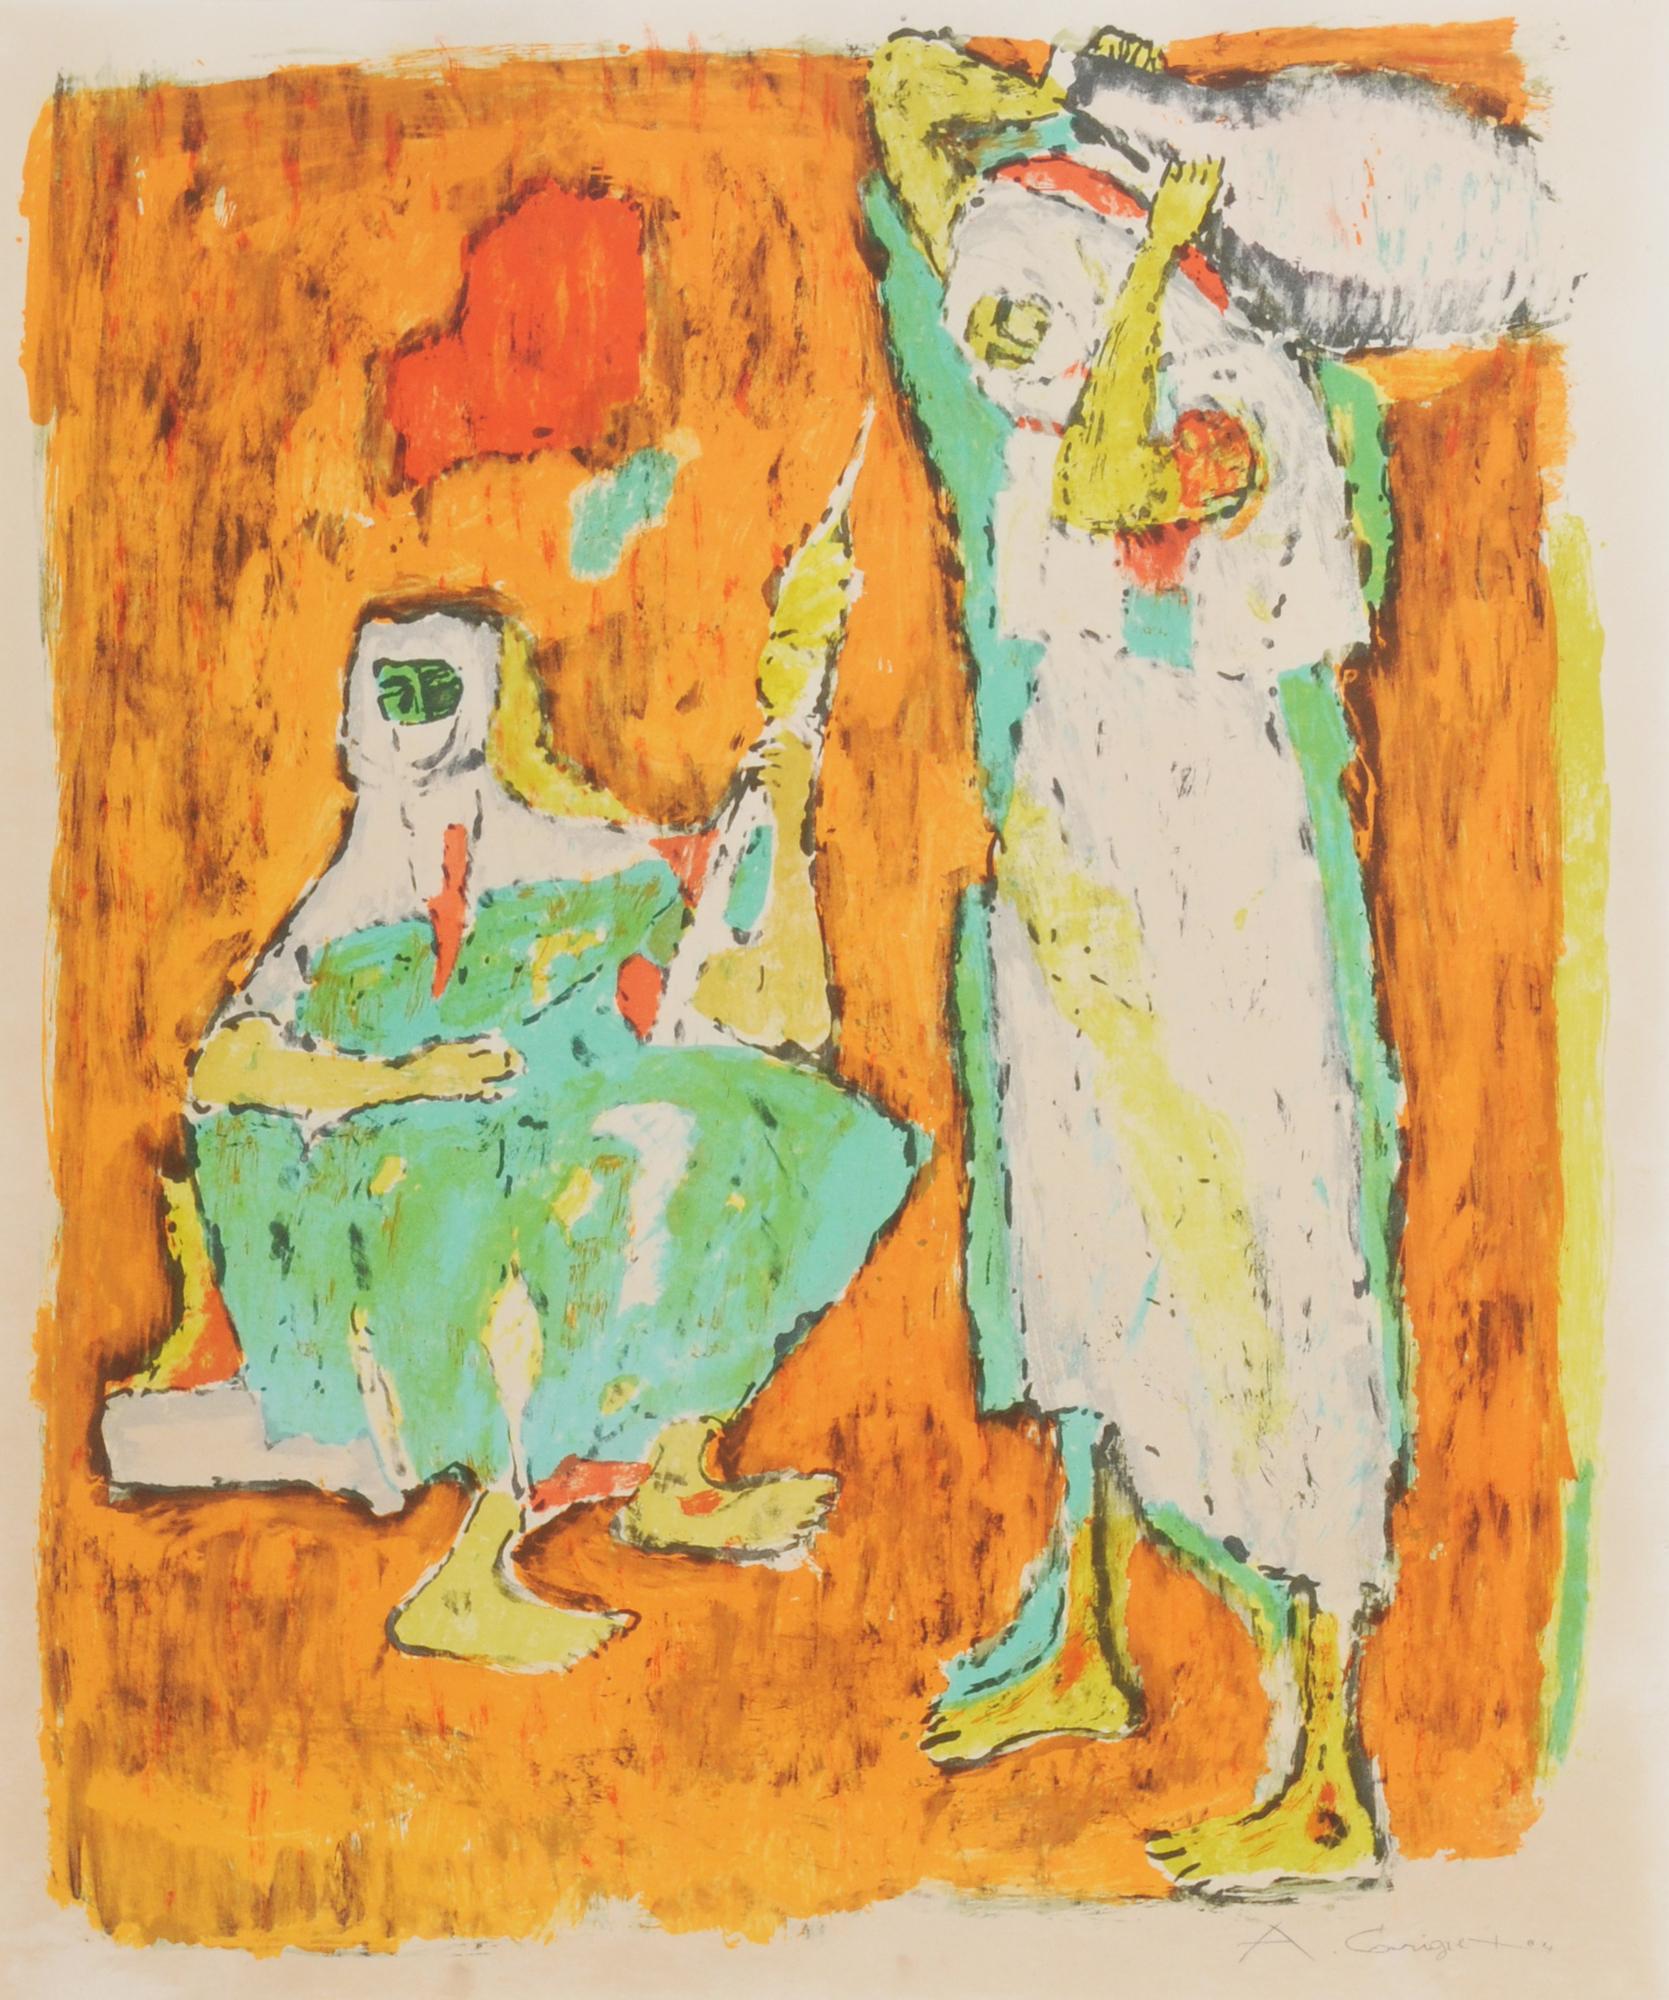 Carigiet Alois, Untitled